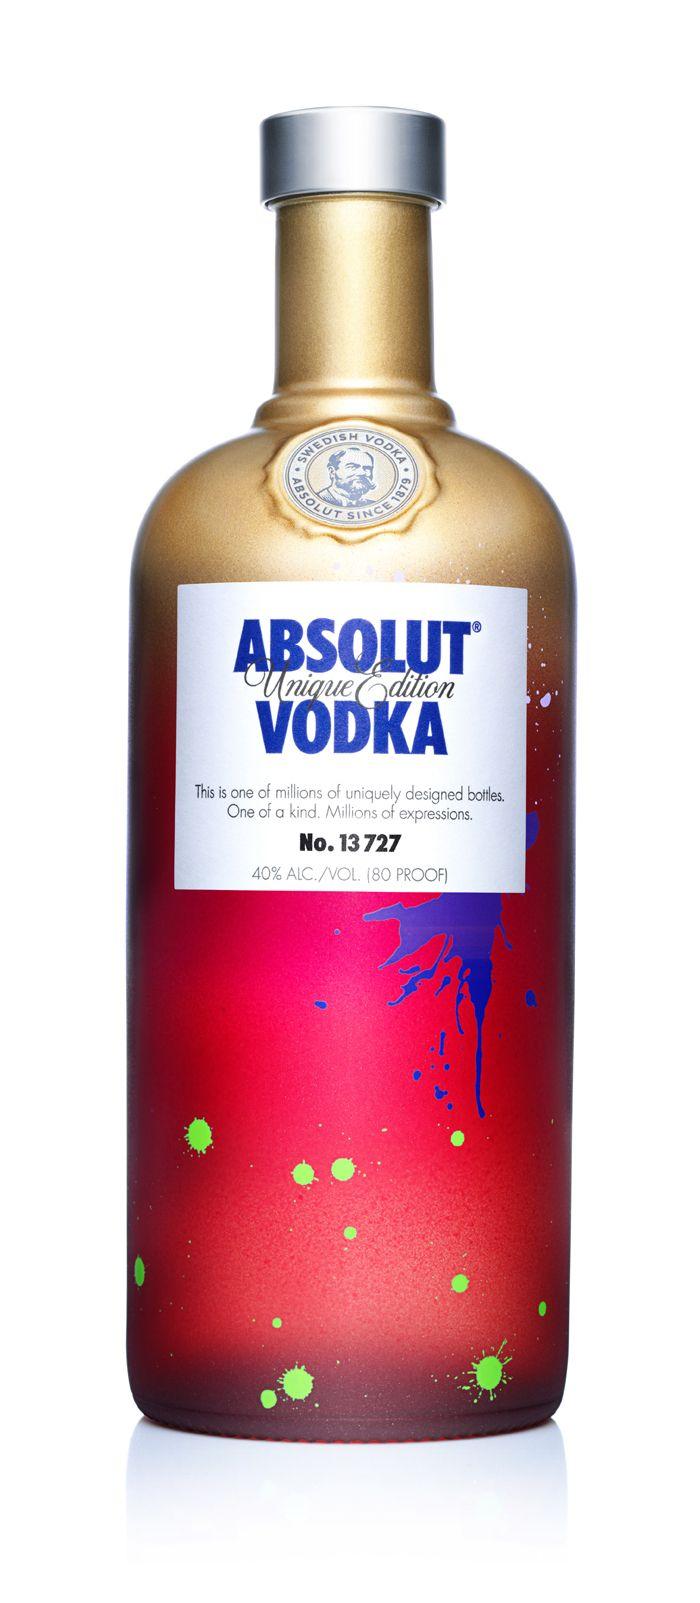 Absolut Unique Vodka Absolut Vodka Vodka Packaging